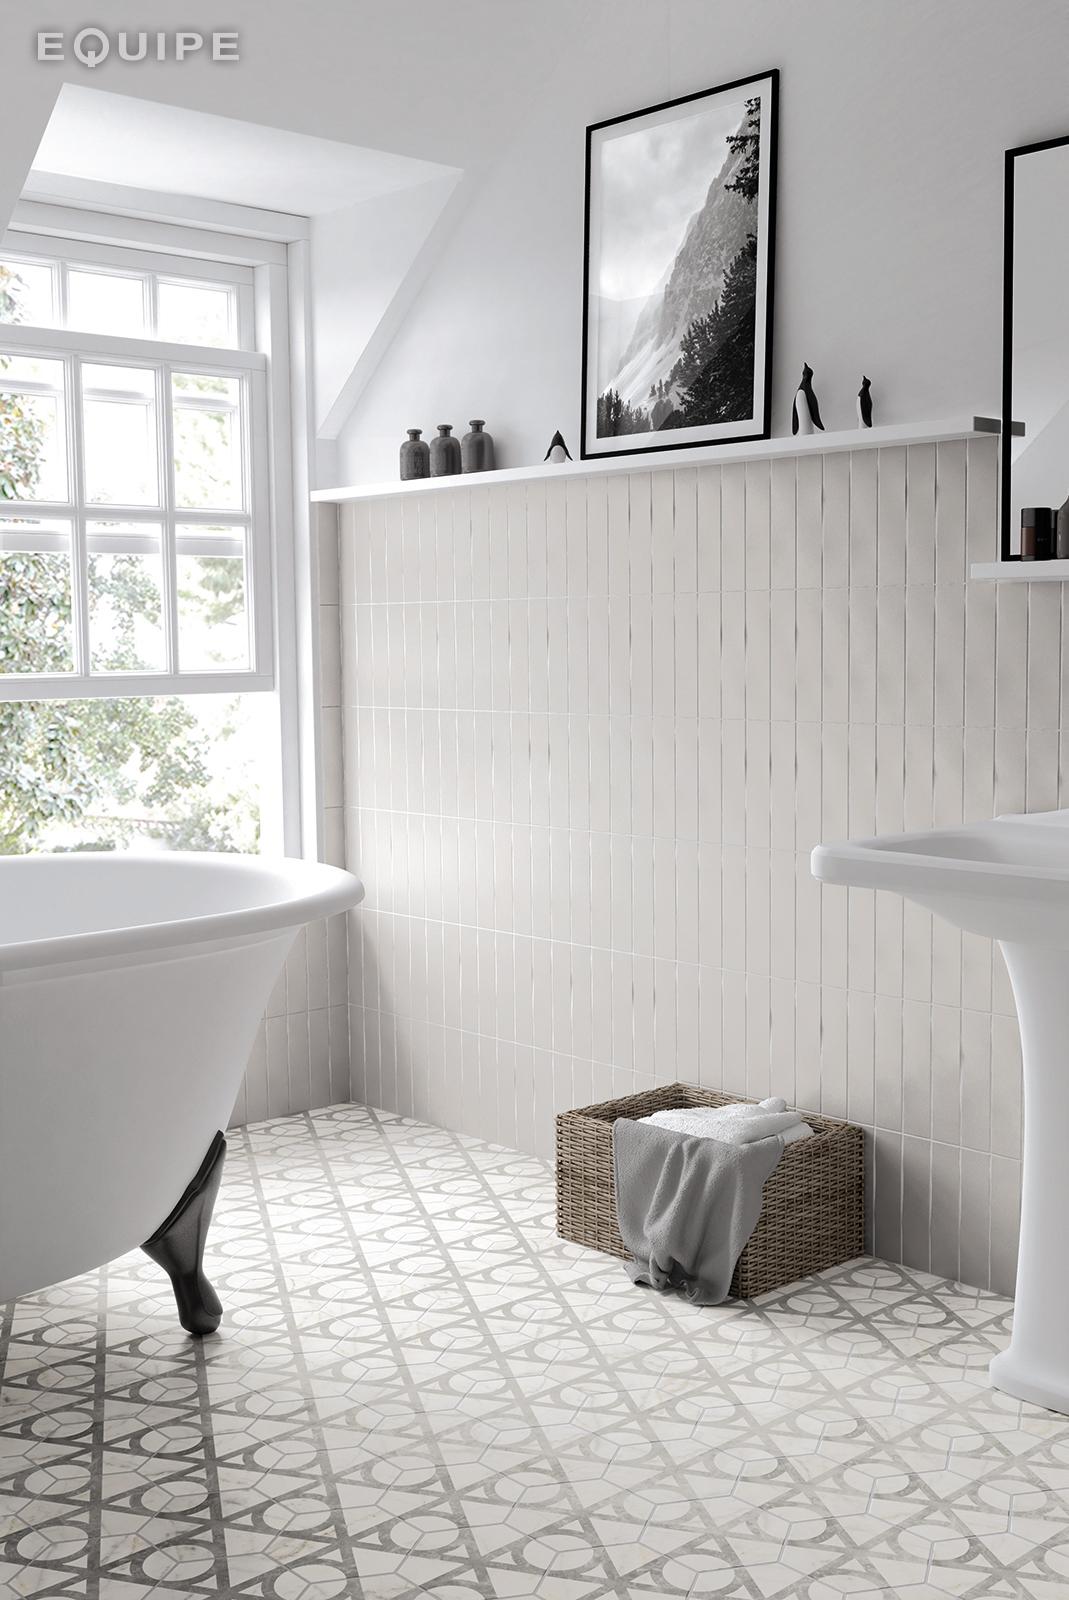 CarraraHexagonFlow bath